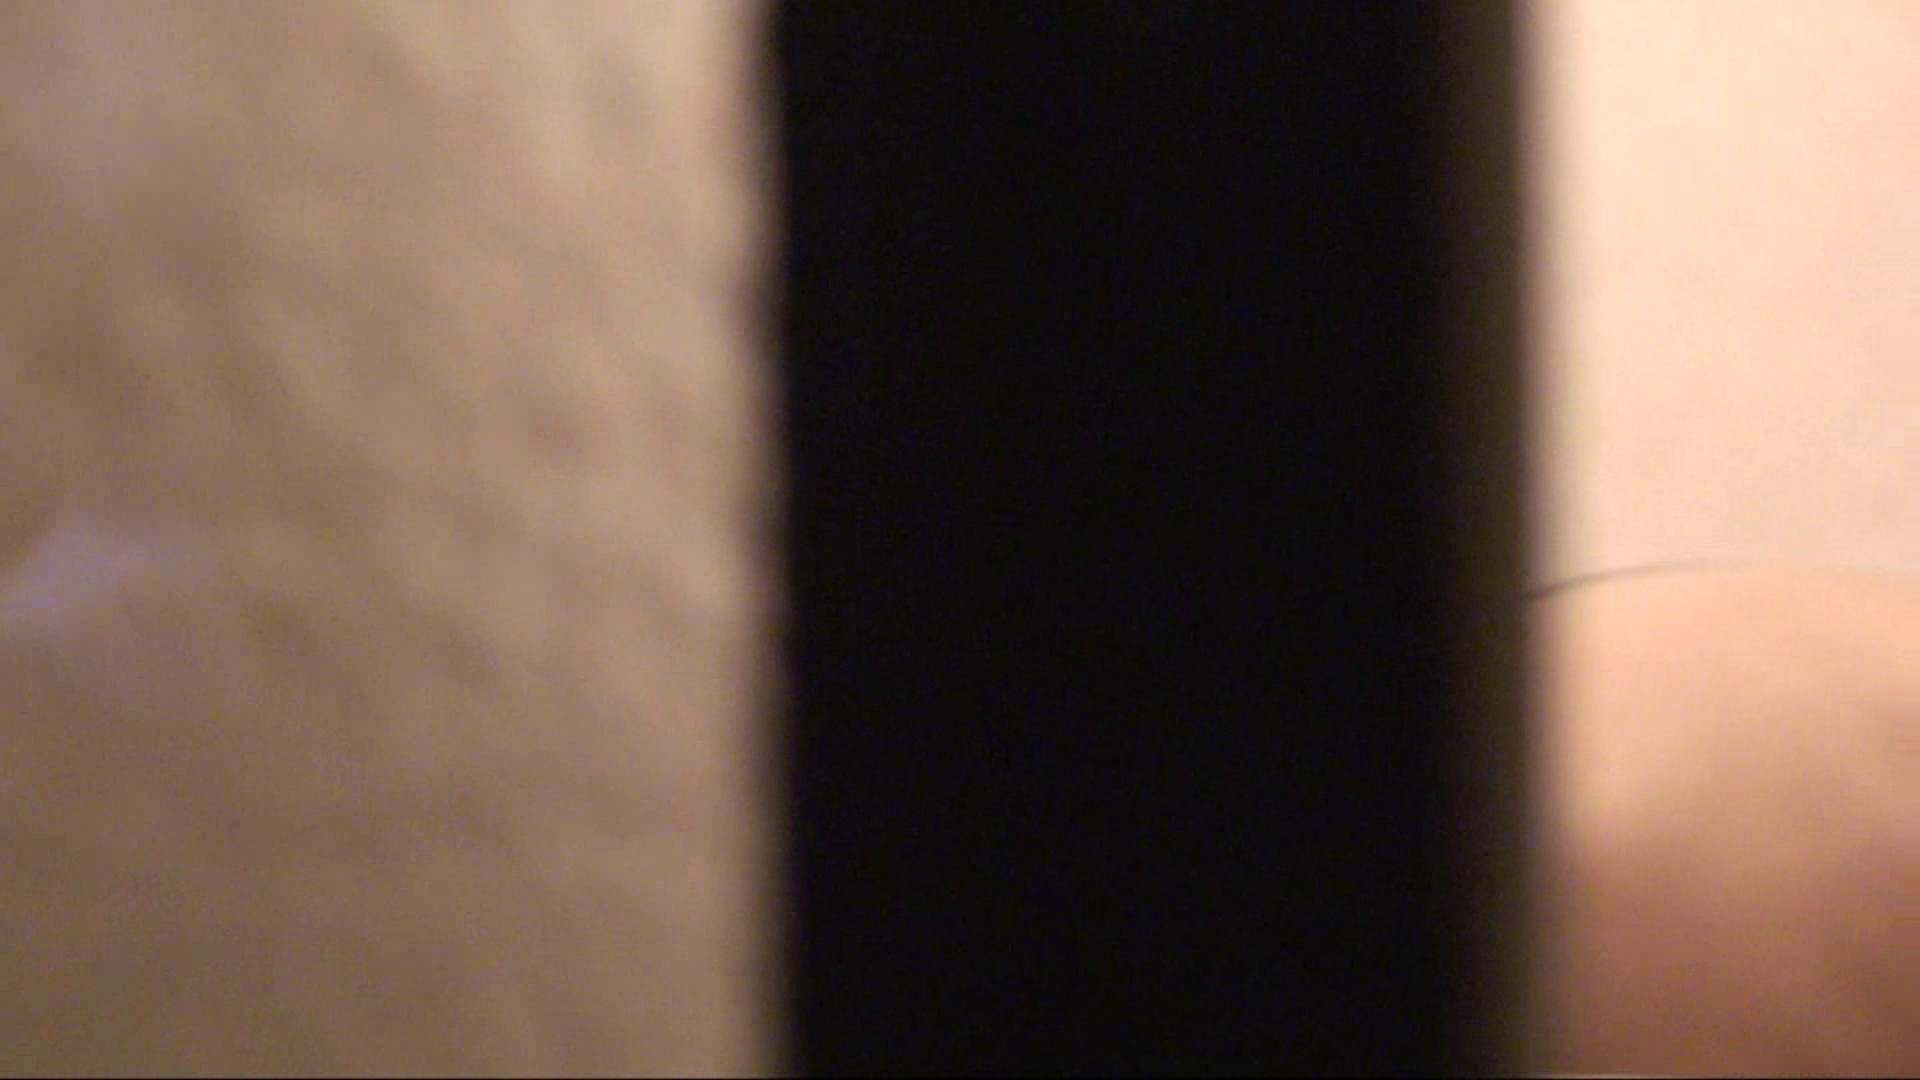 vol.01必見!白肌嬢の乳首が丸見え。極上美人のすっぴん顔をハイビジョンで! 美肌 アダルト動画キャプチャ 71画像 49